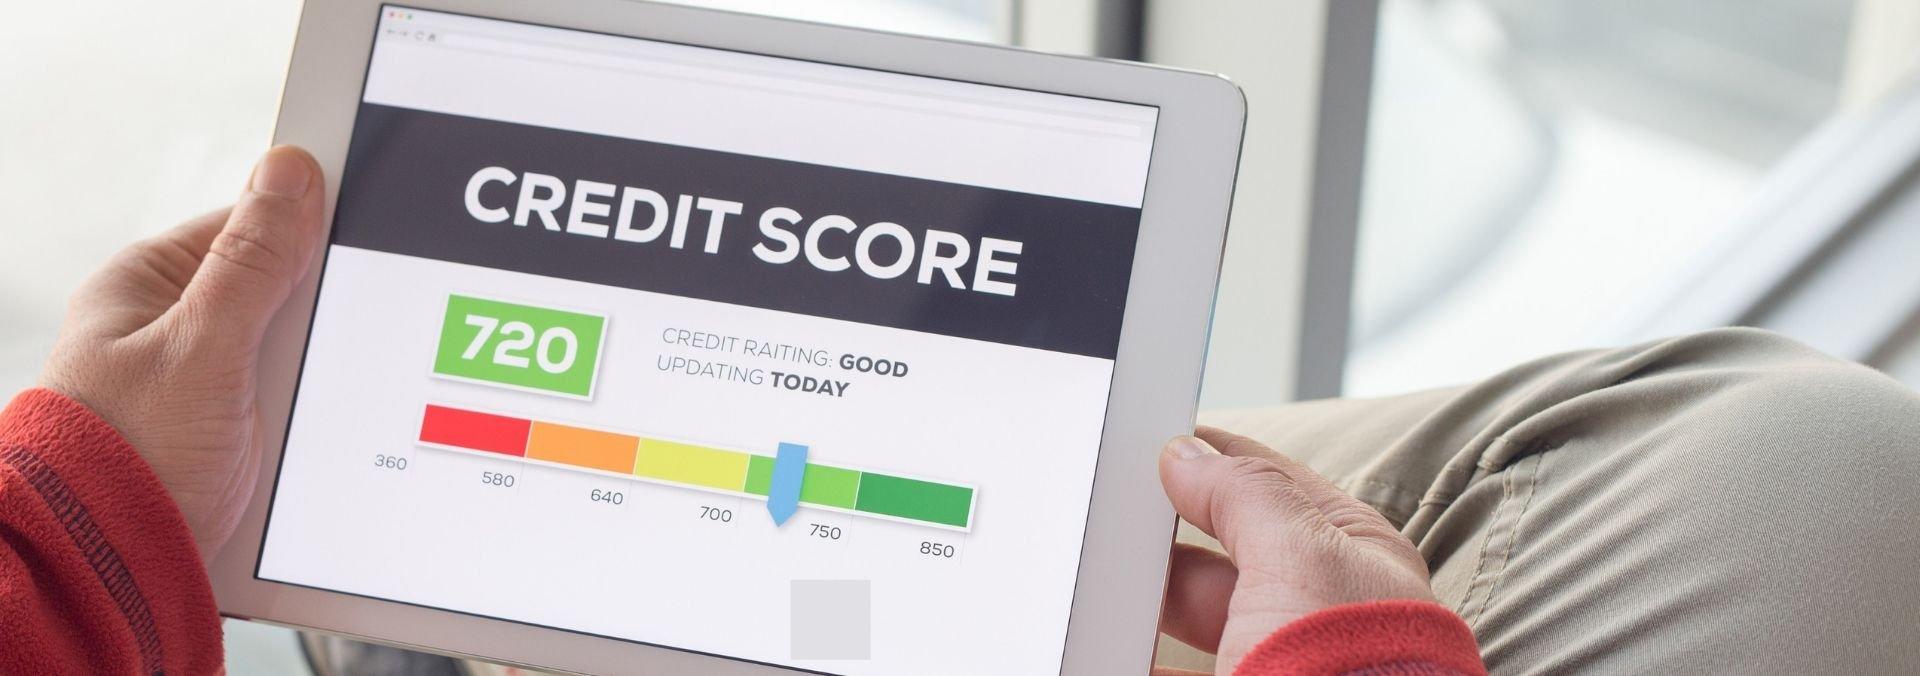 view credit score online